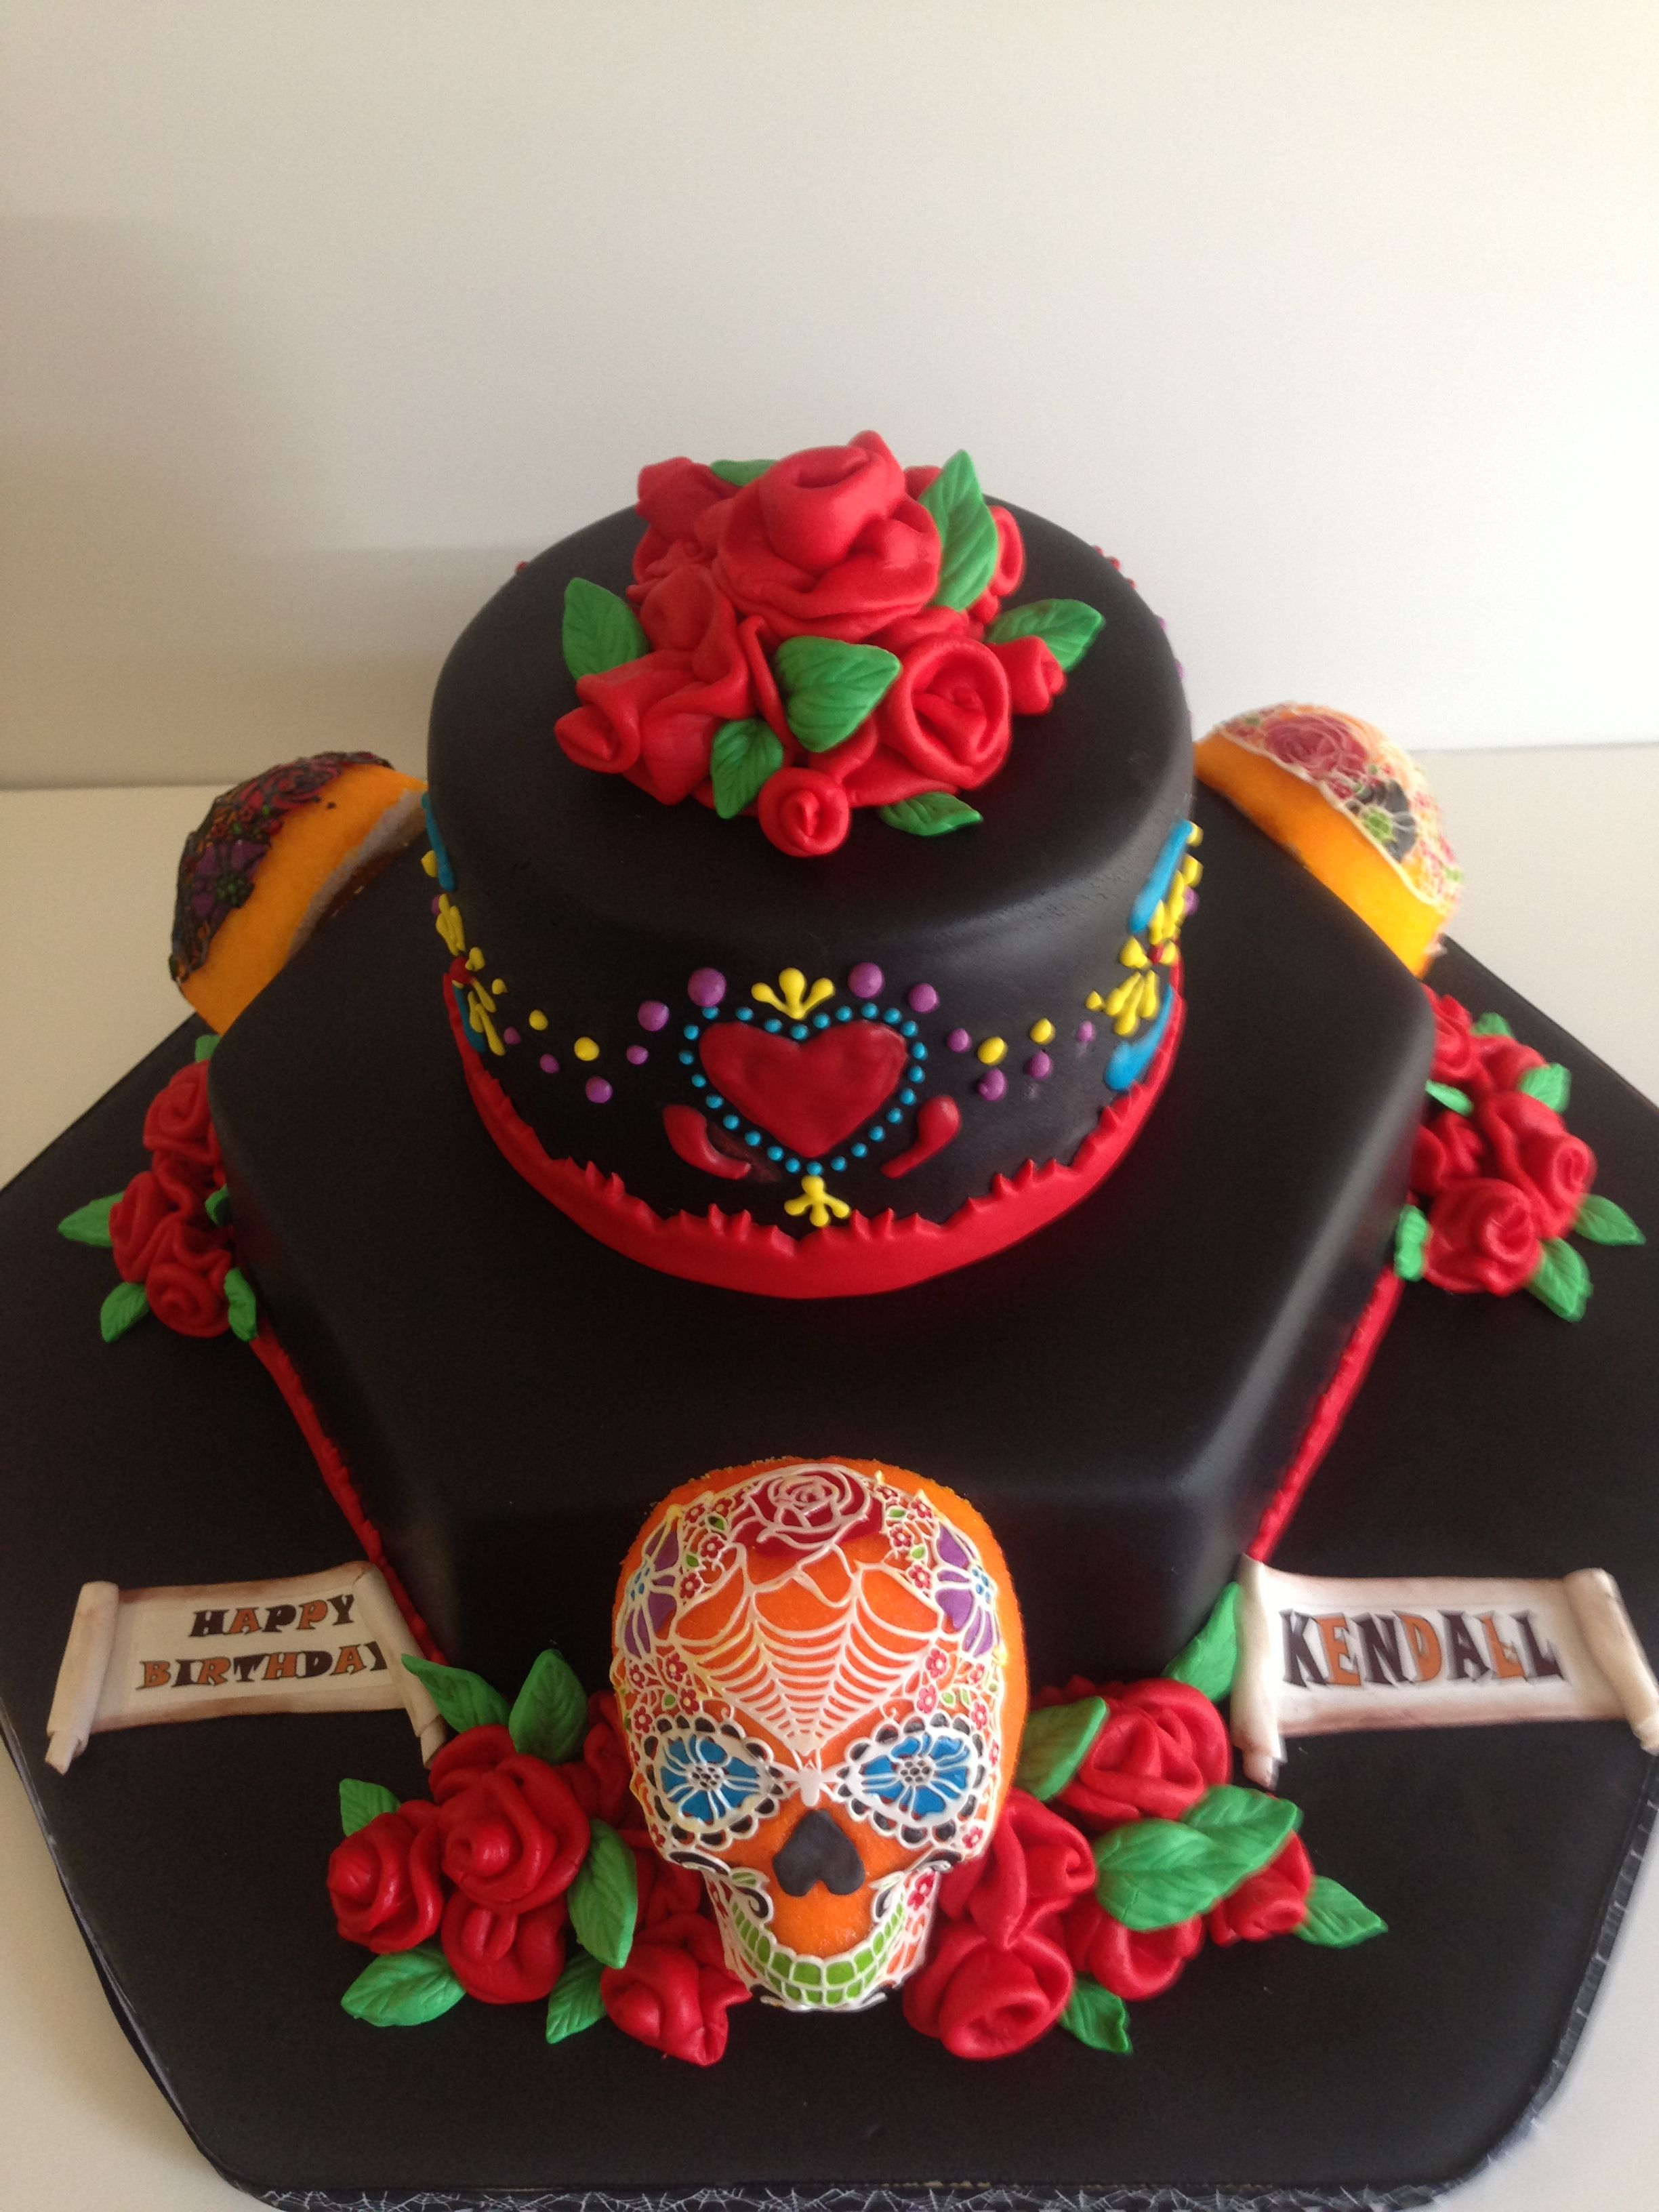 Sugar Skull Cake Day Of The Dead Black Red Gothic Sugar